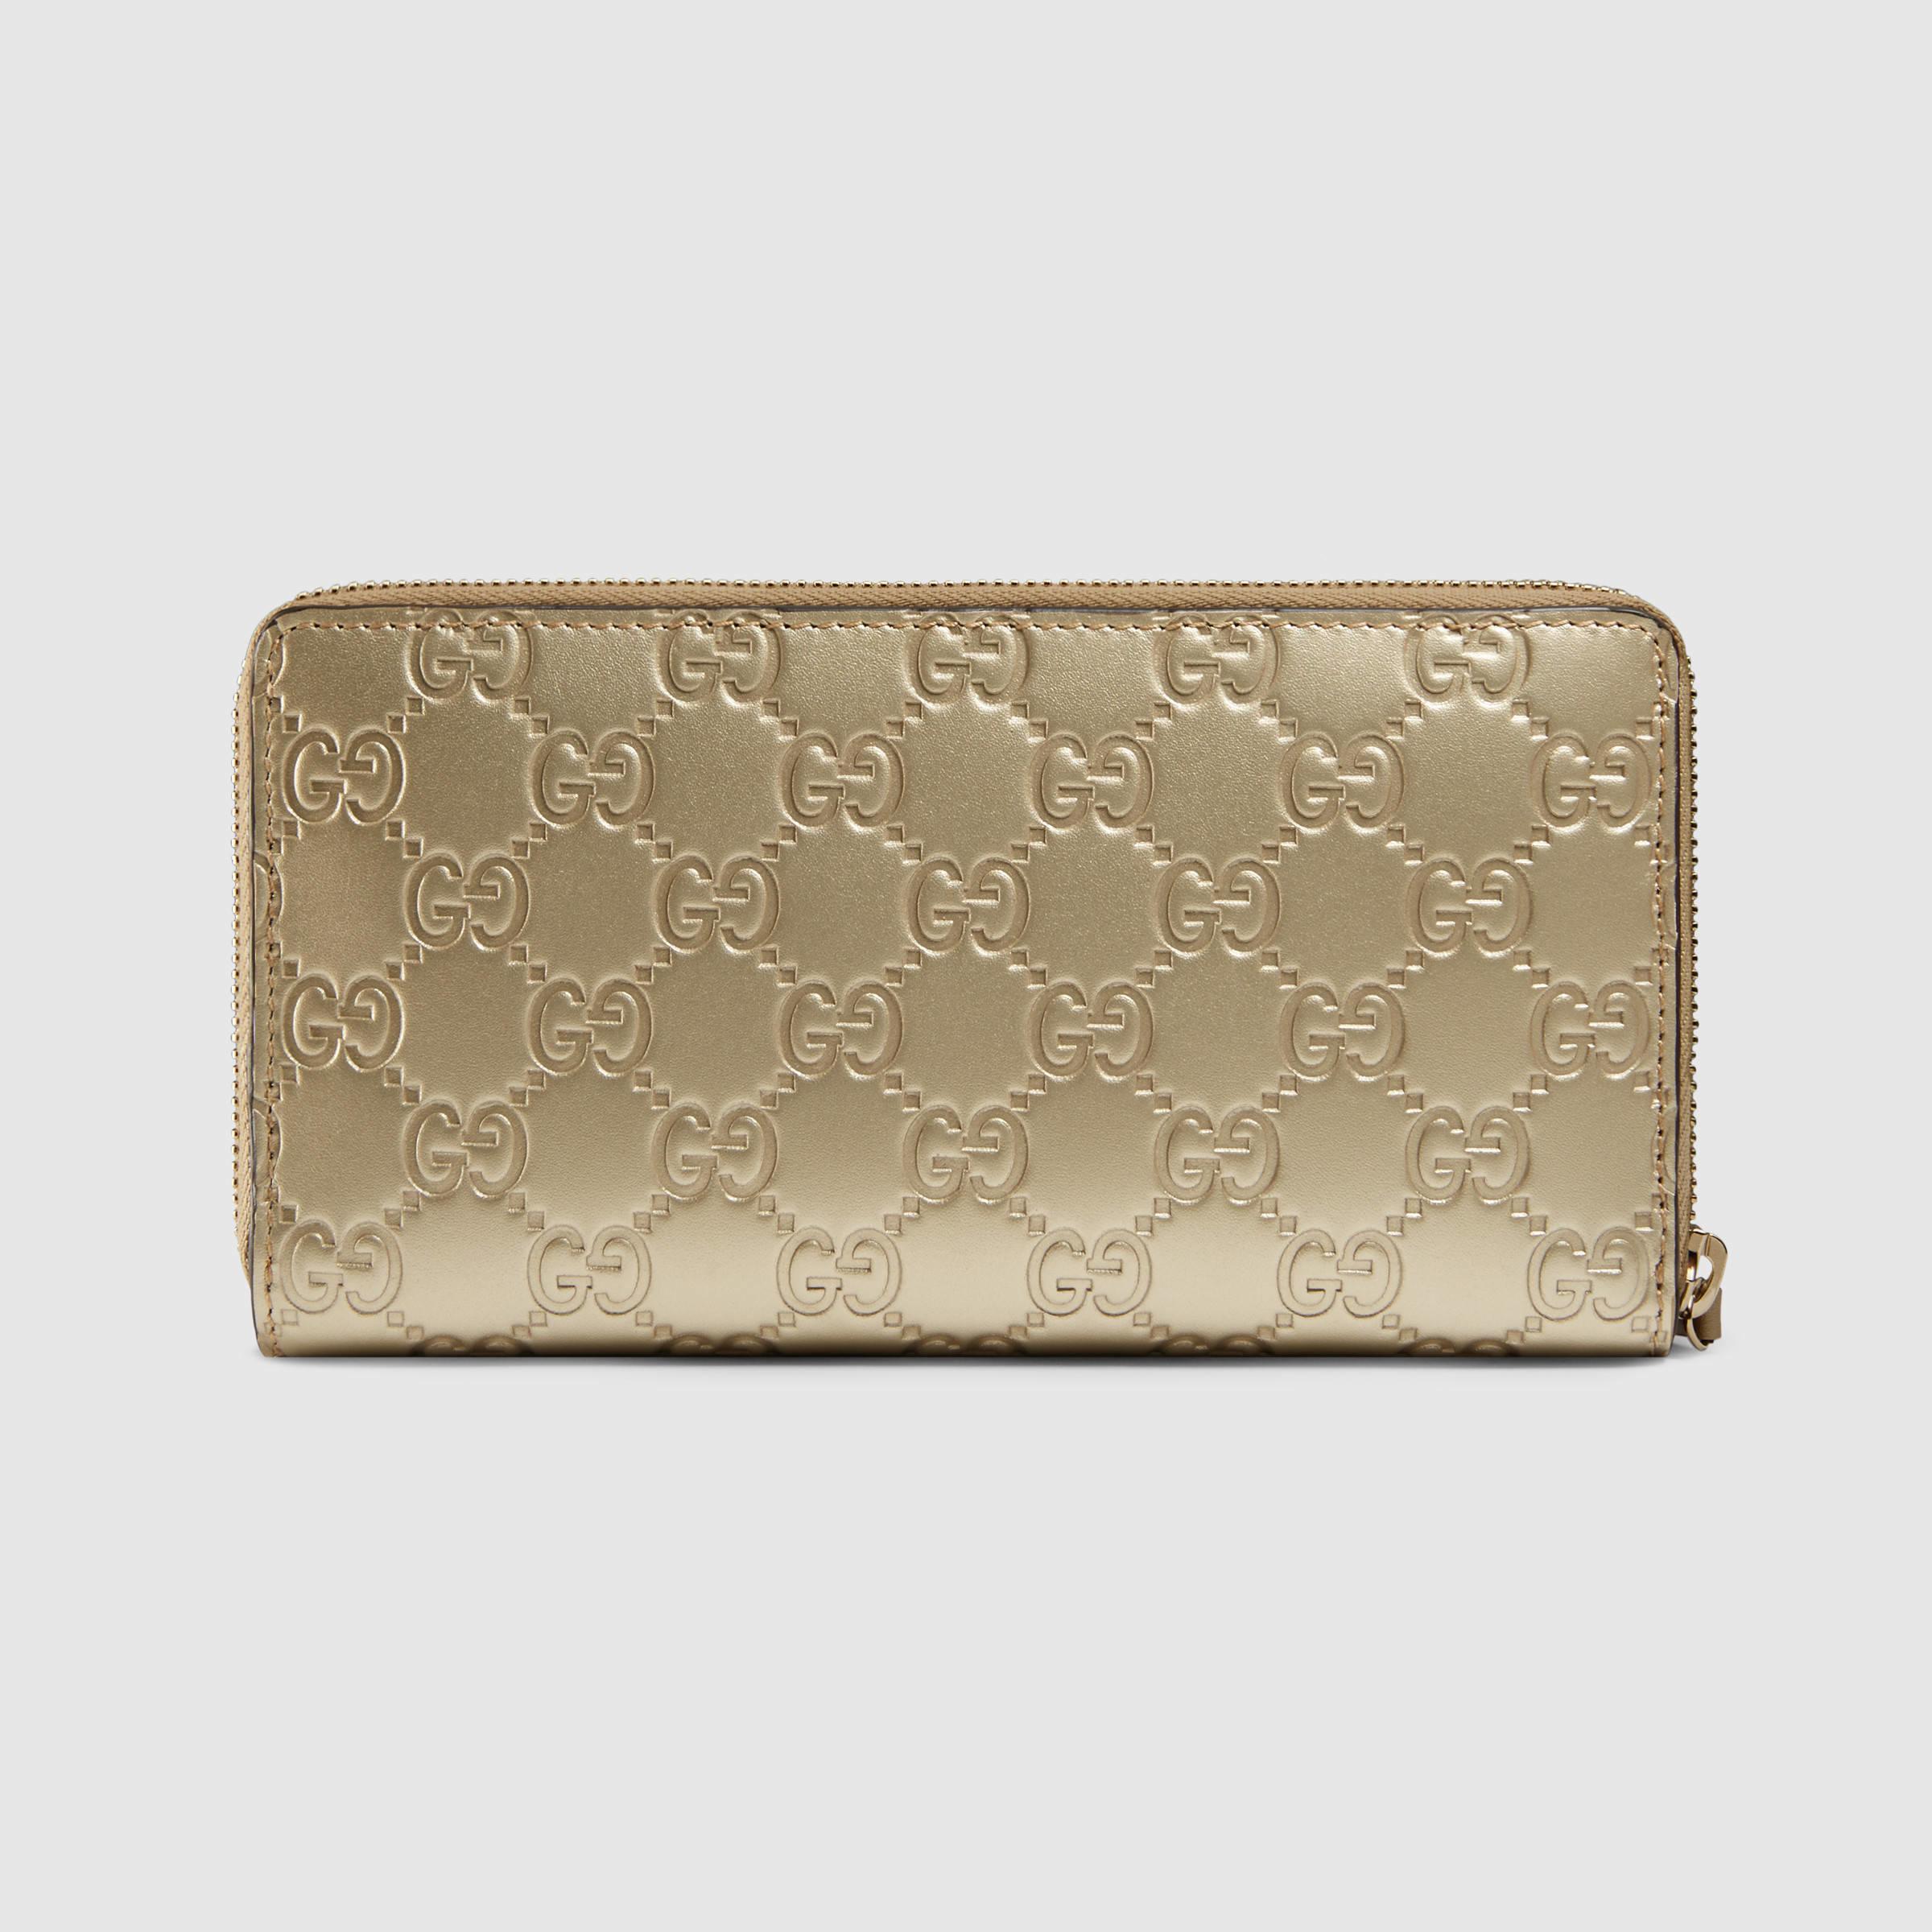 c255c0082d9d Gucci Bow Signature Zip Around Wallet in Metallic - Lyst